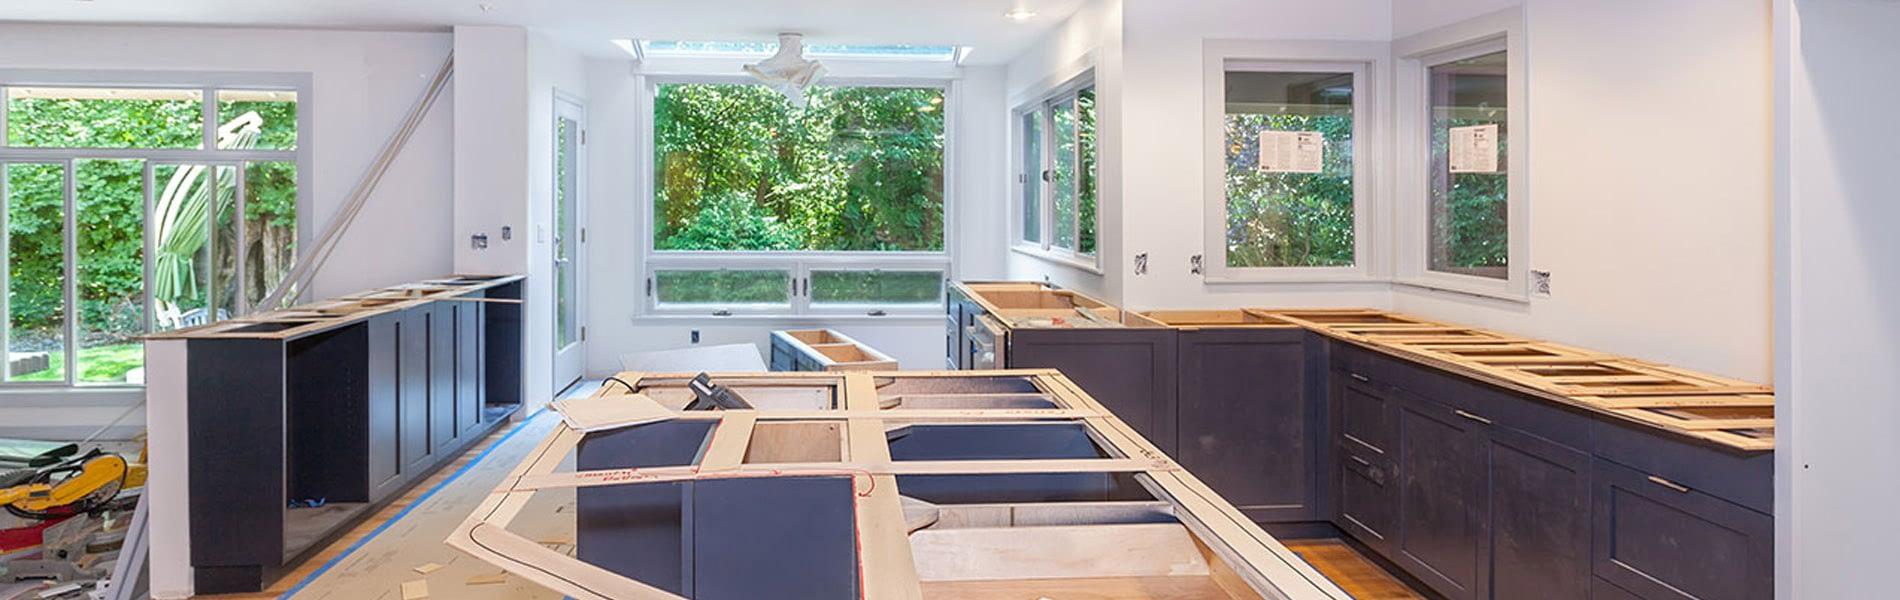 Home Refurbishment Company London